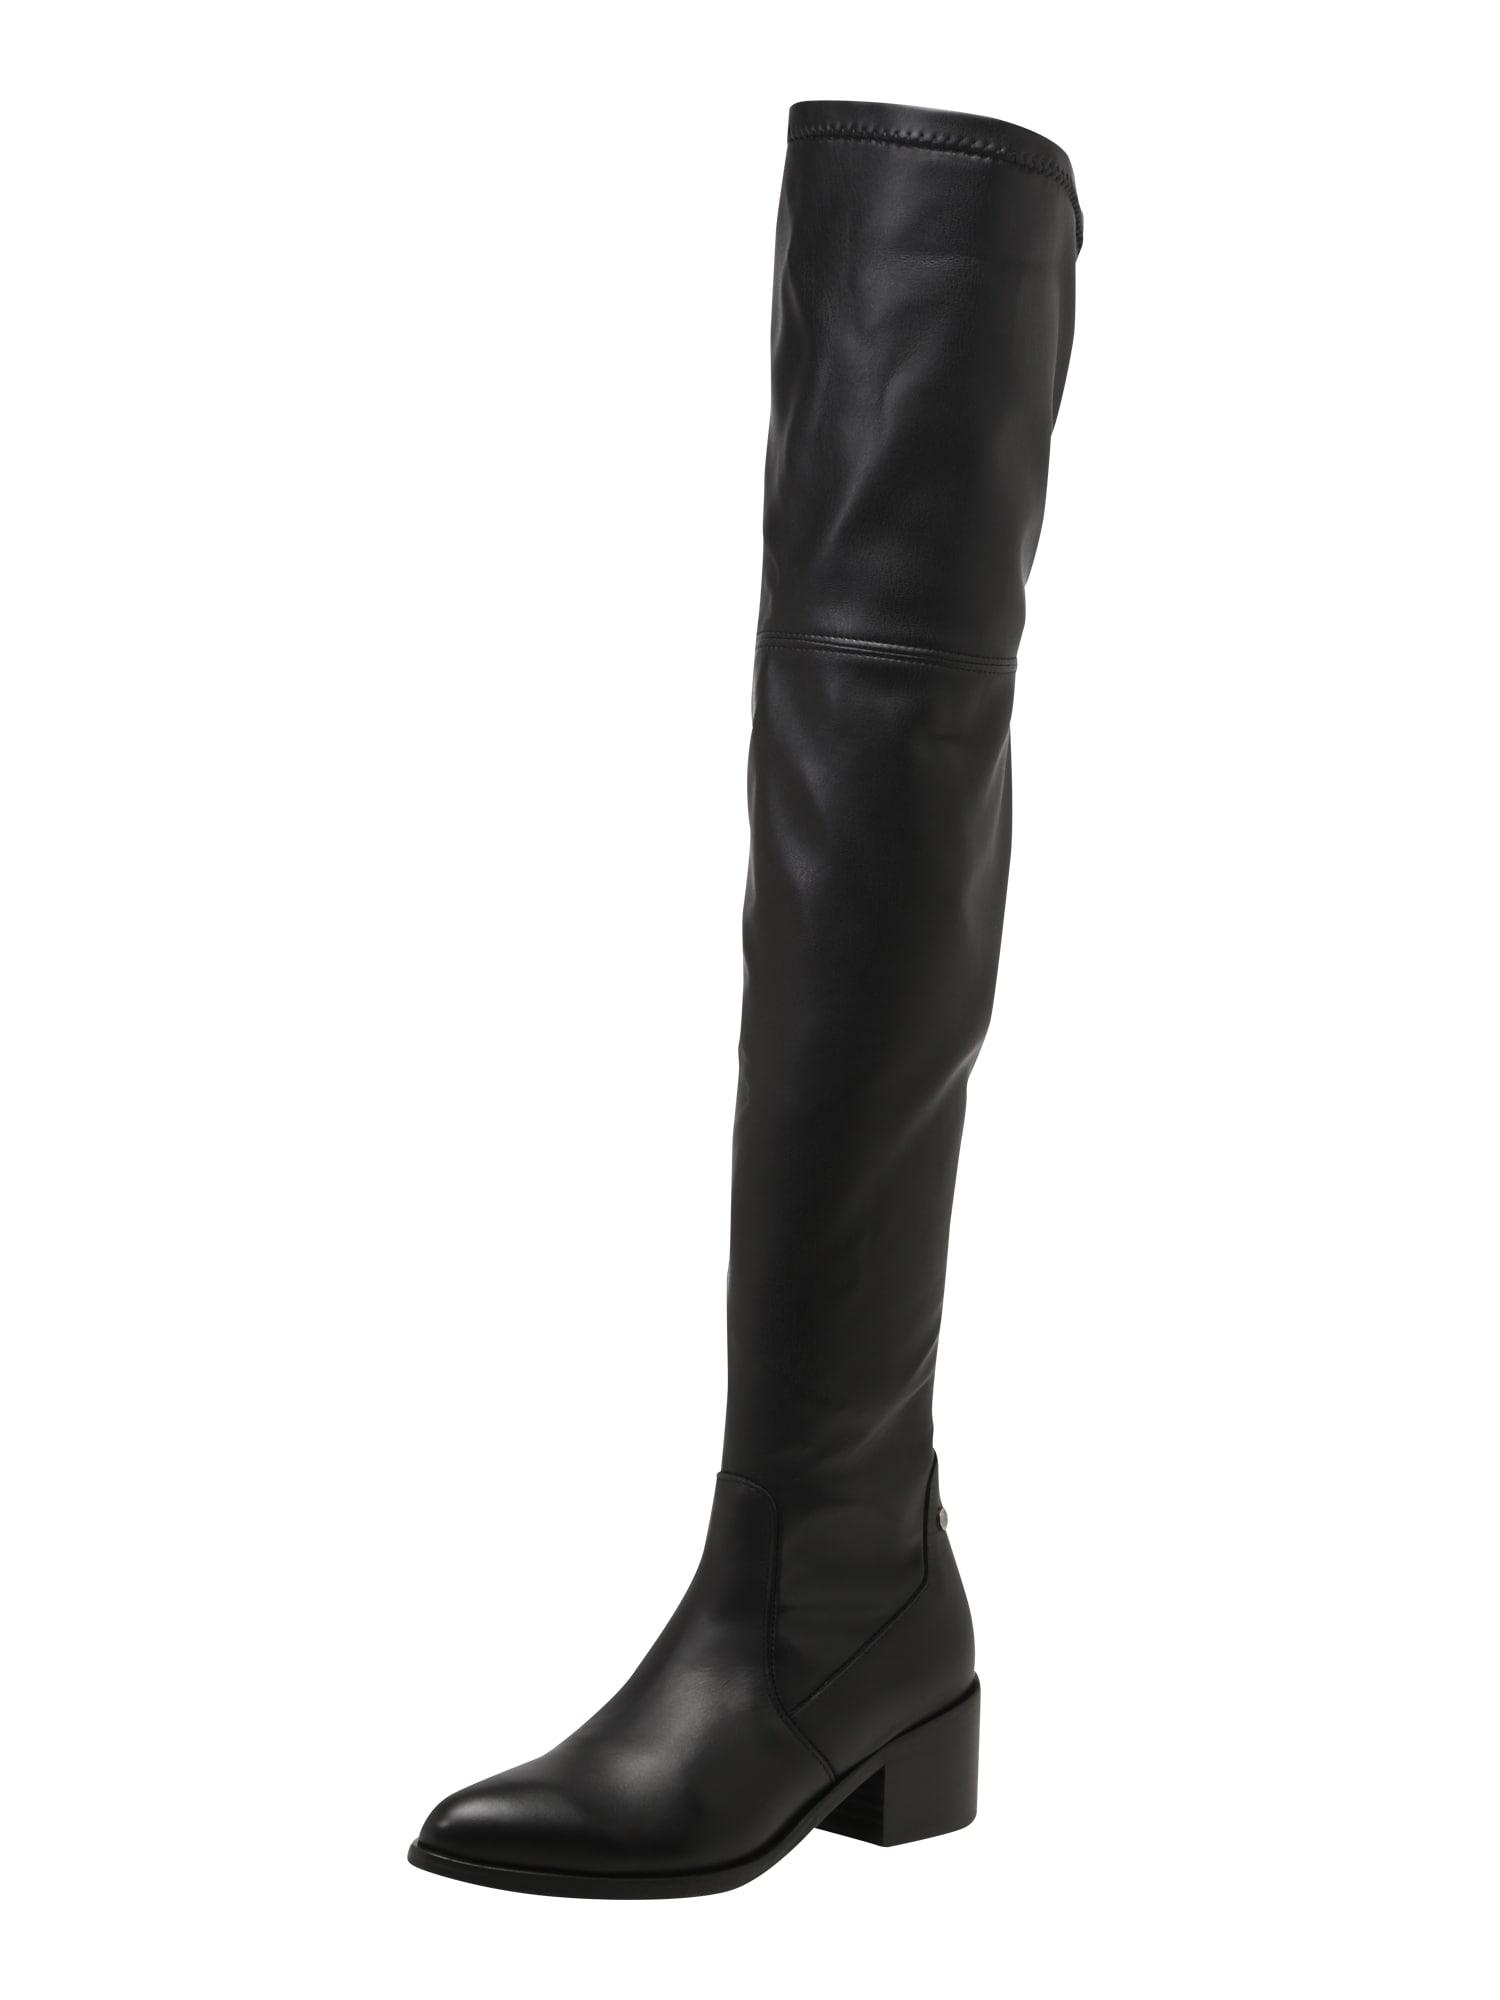 TOMMY HILFIGER, Dames Overknee laarzen, zwart